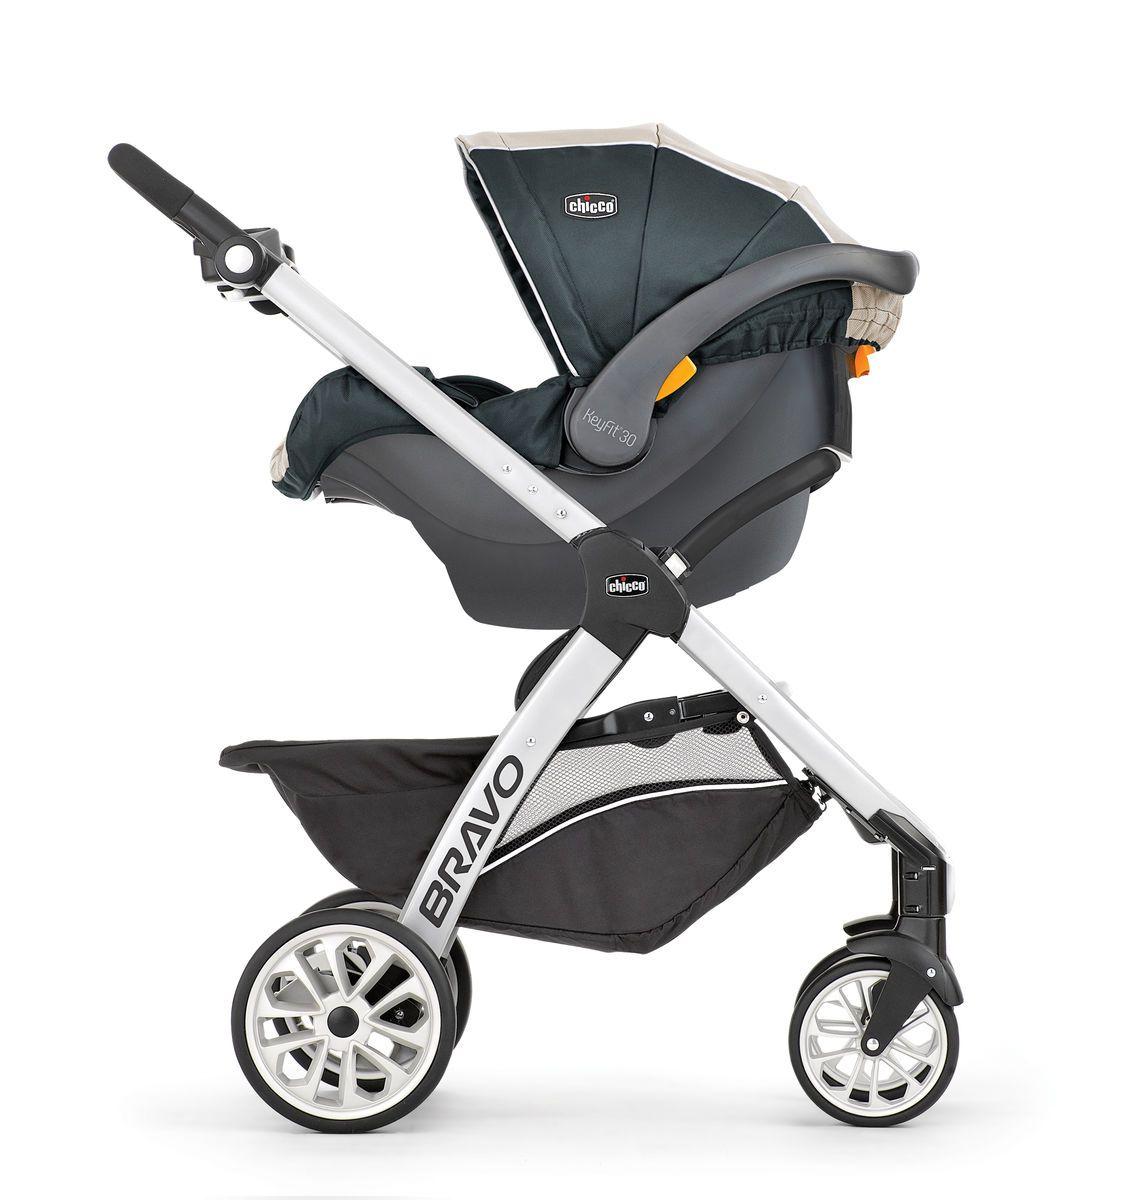 Chicco Bravo Trio Travel System Stroller Lilla Baby Buy 2 Get 20 Moments Bath Foam Soft Cup